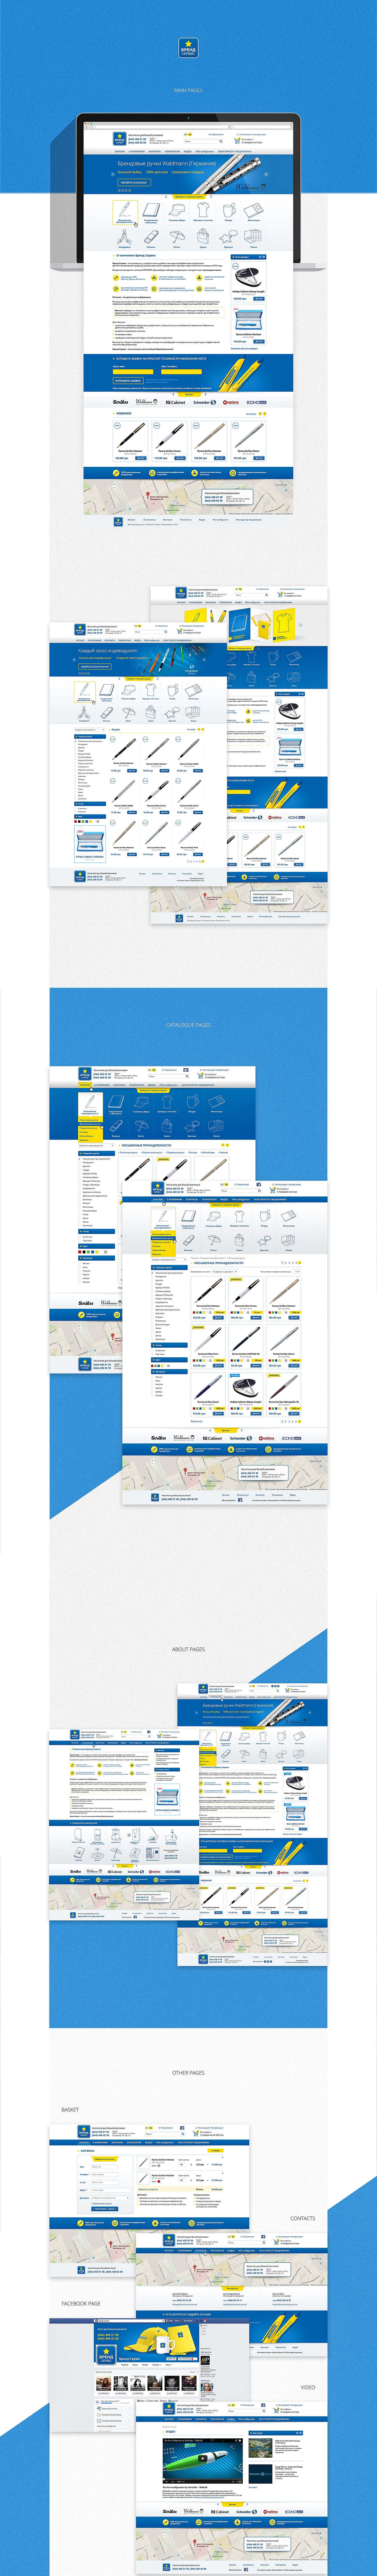 brand service brand service Website Design website presentation Web Design